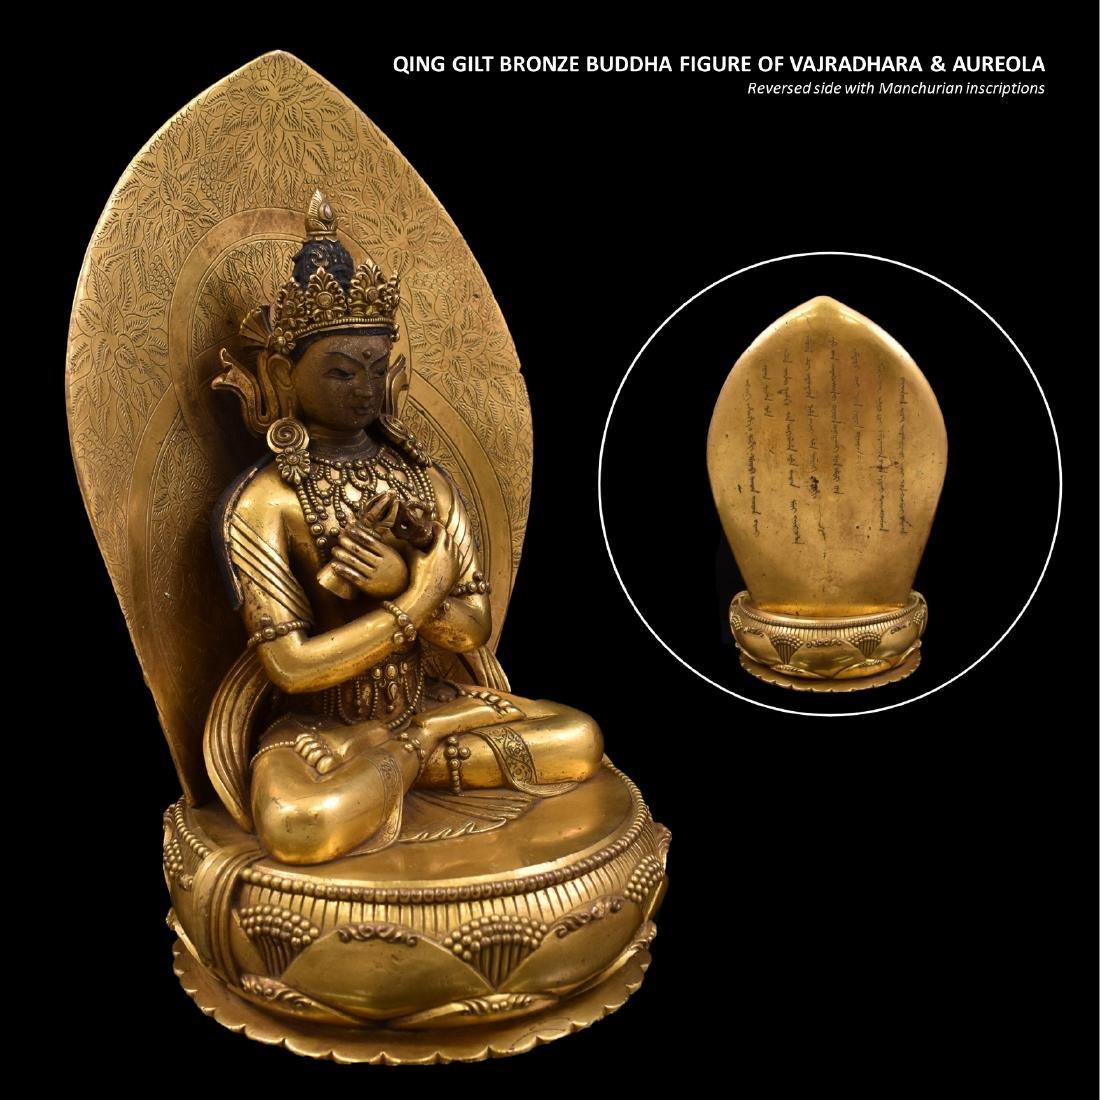 QING GILT BRONZE BUDDHA FIGURE OF VAJRADHARA & AUREOLA